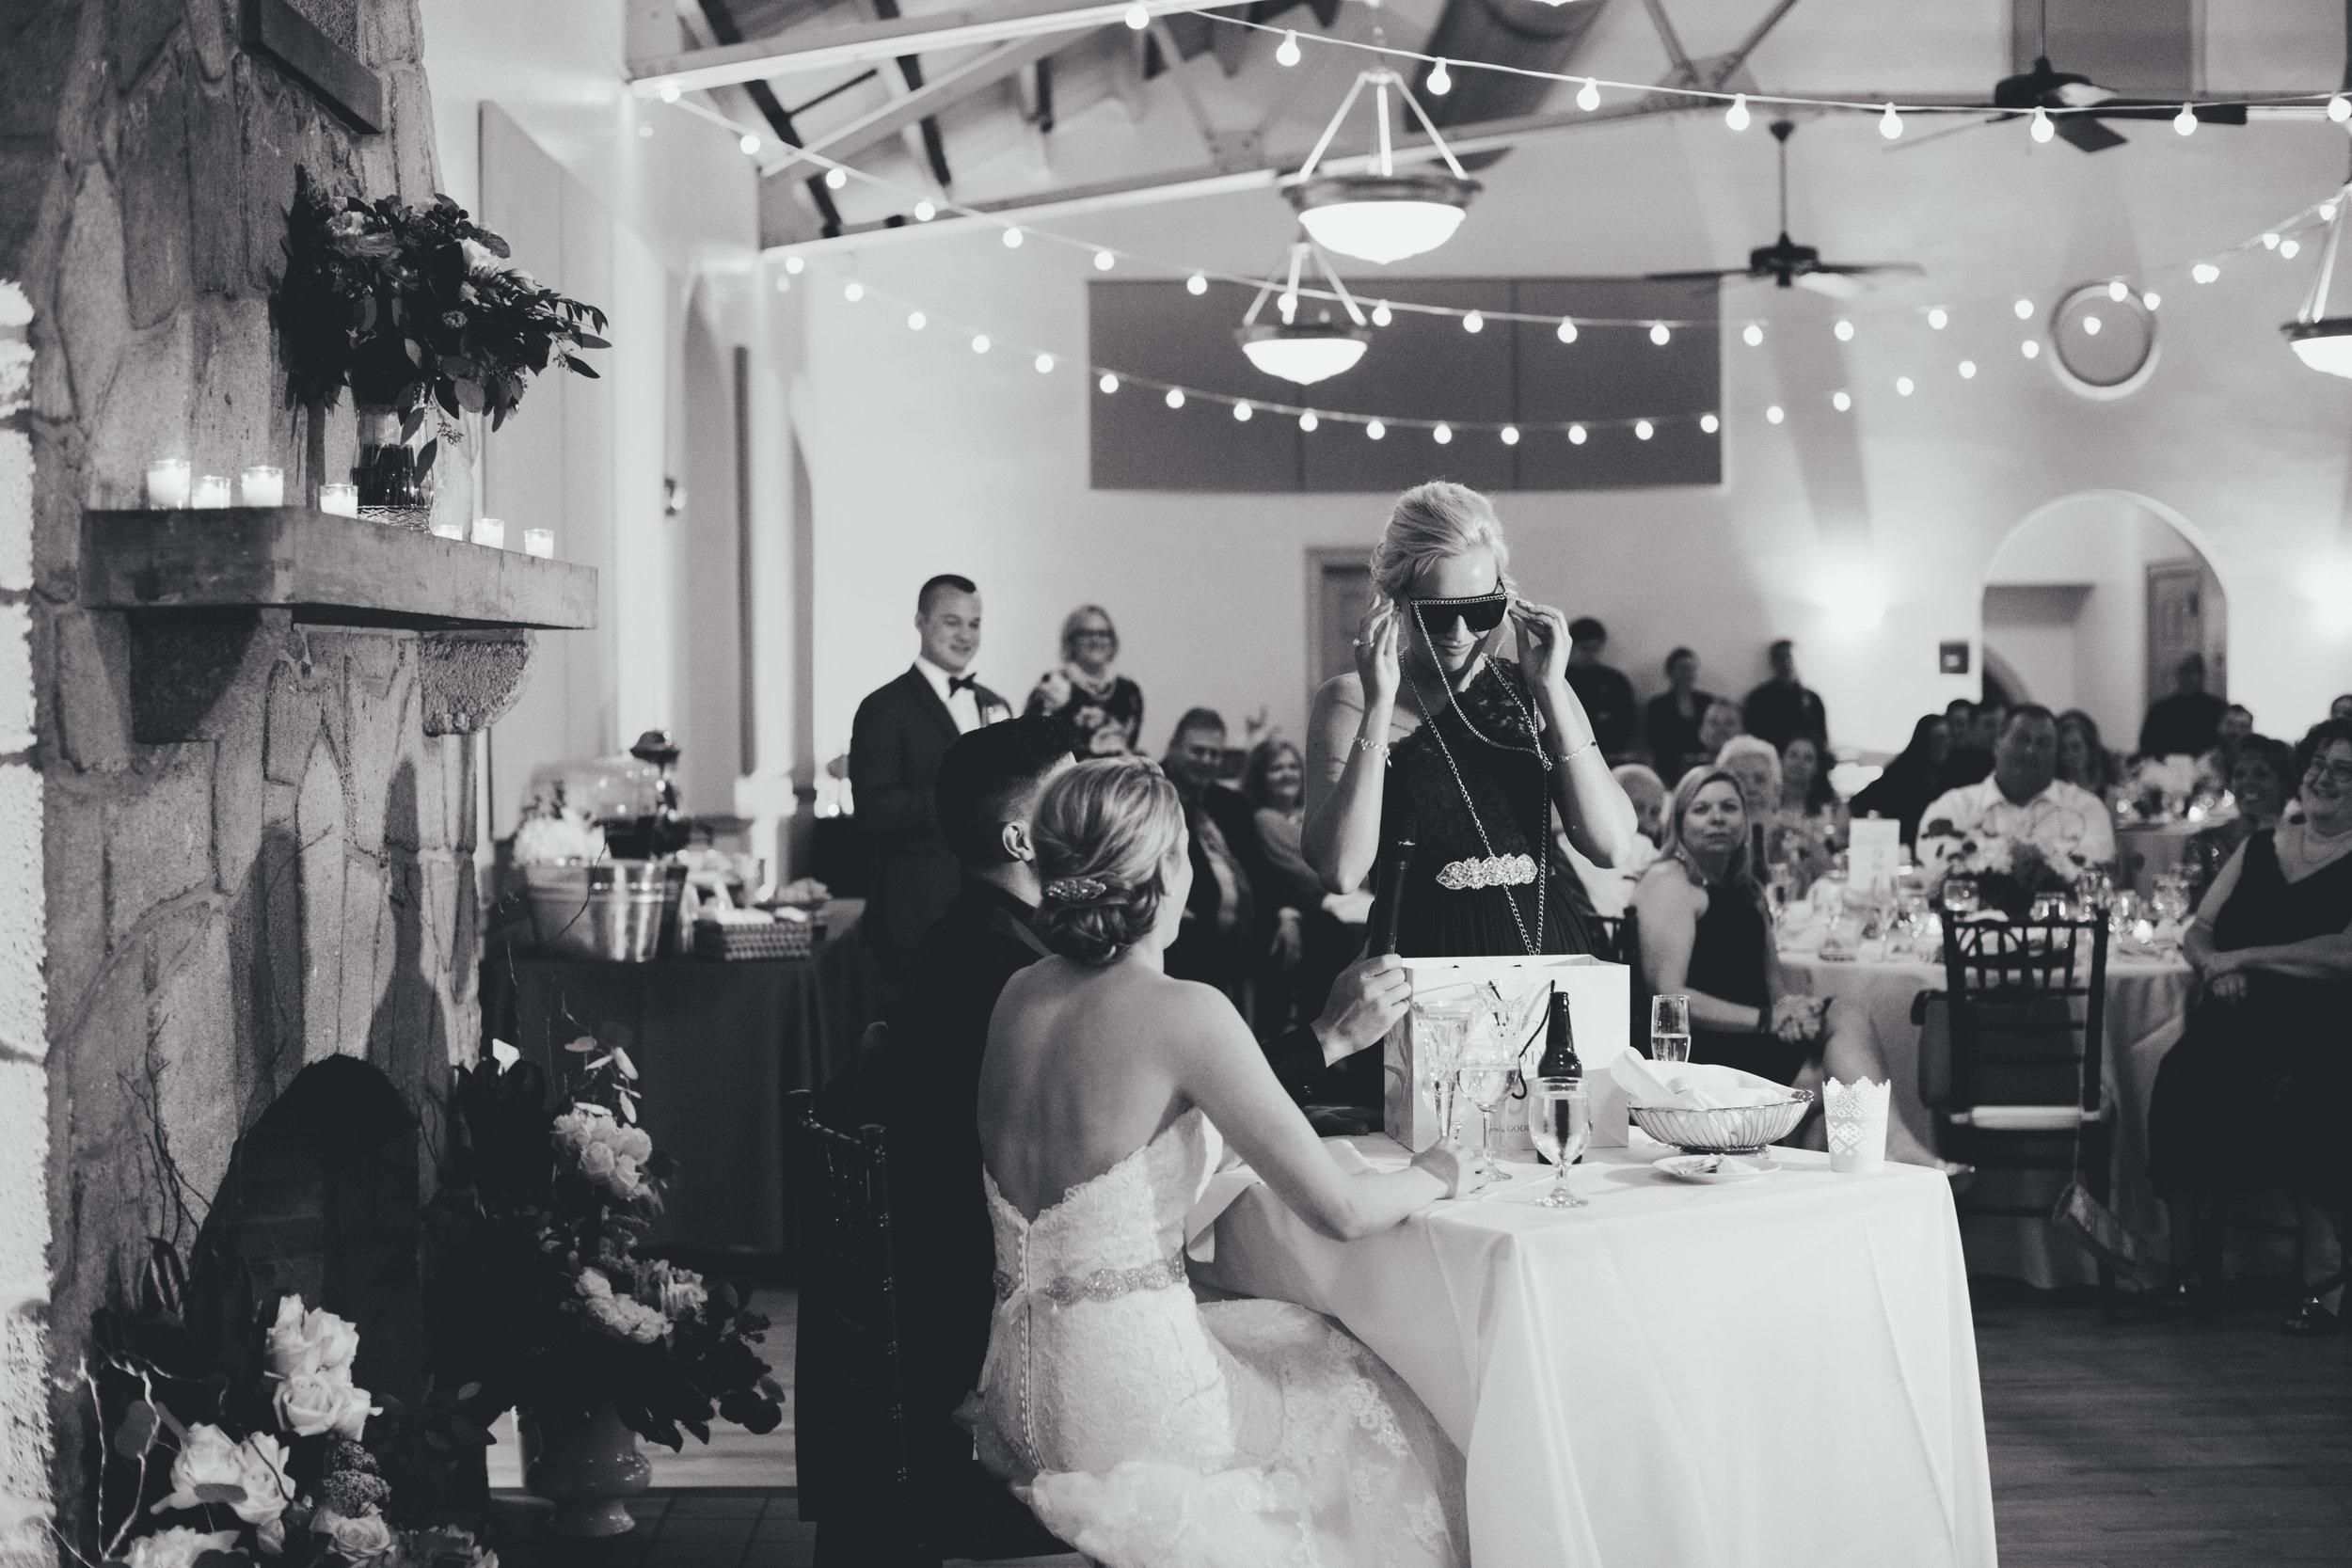 magnolia building wedding downtown lakeland wedding jake and katie photography-16.jpg